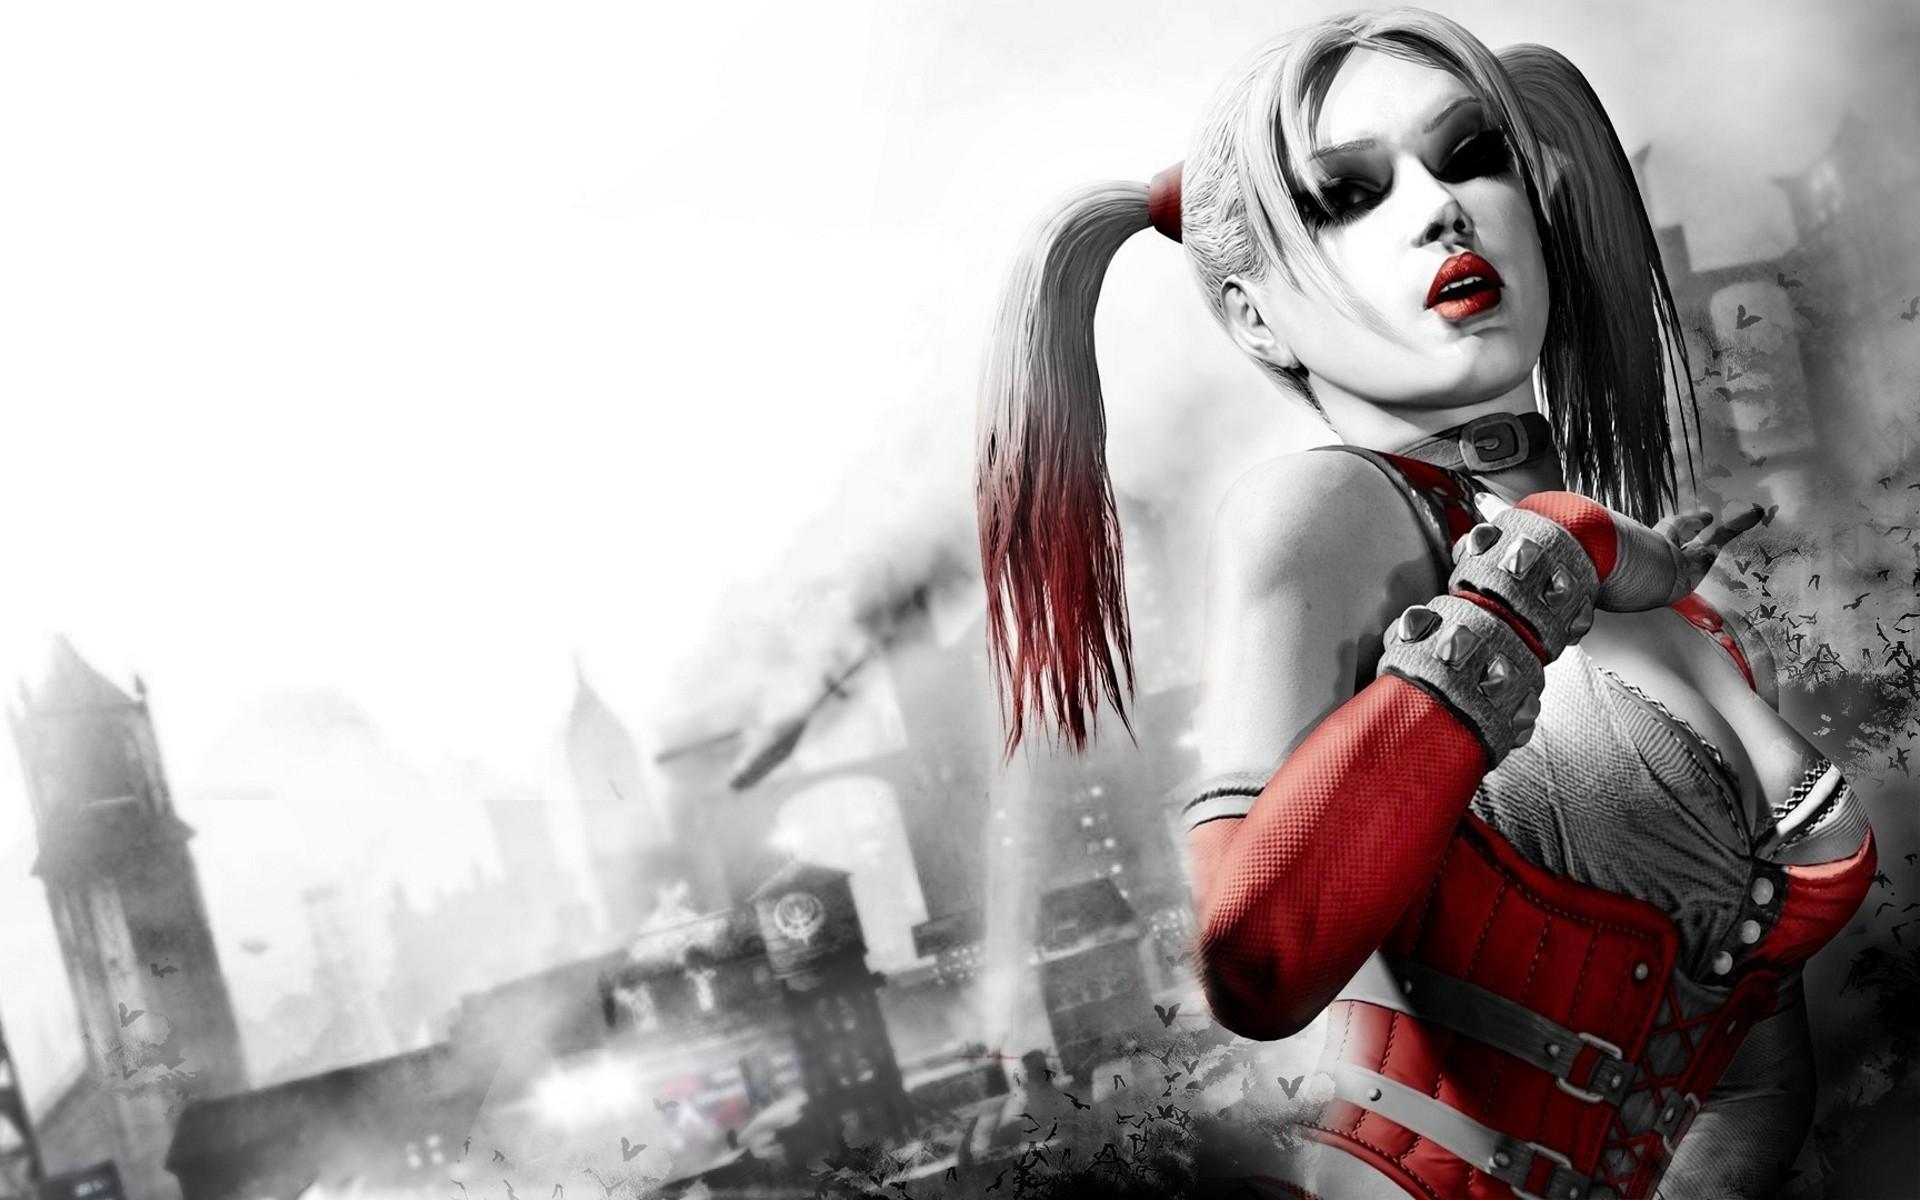 Harley Quinn Arkham Asylum HD Wallpaper – Your HD Wallpaper #ID62142  (shared via SlingPic